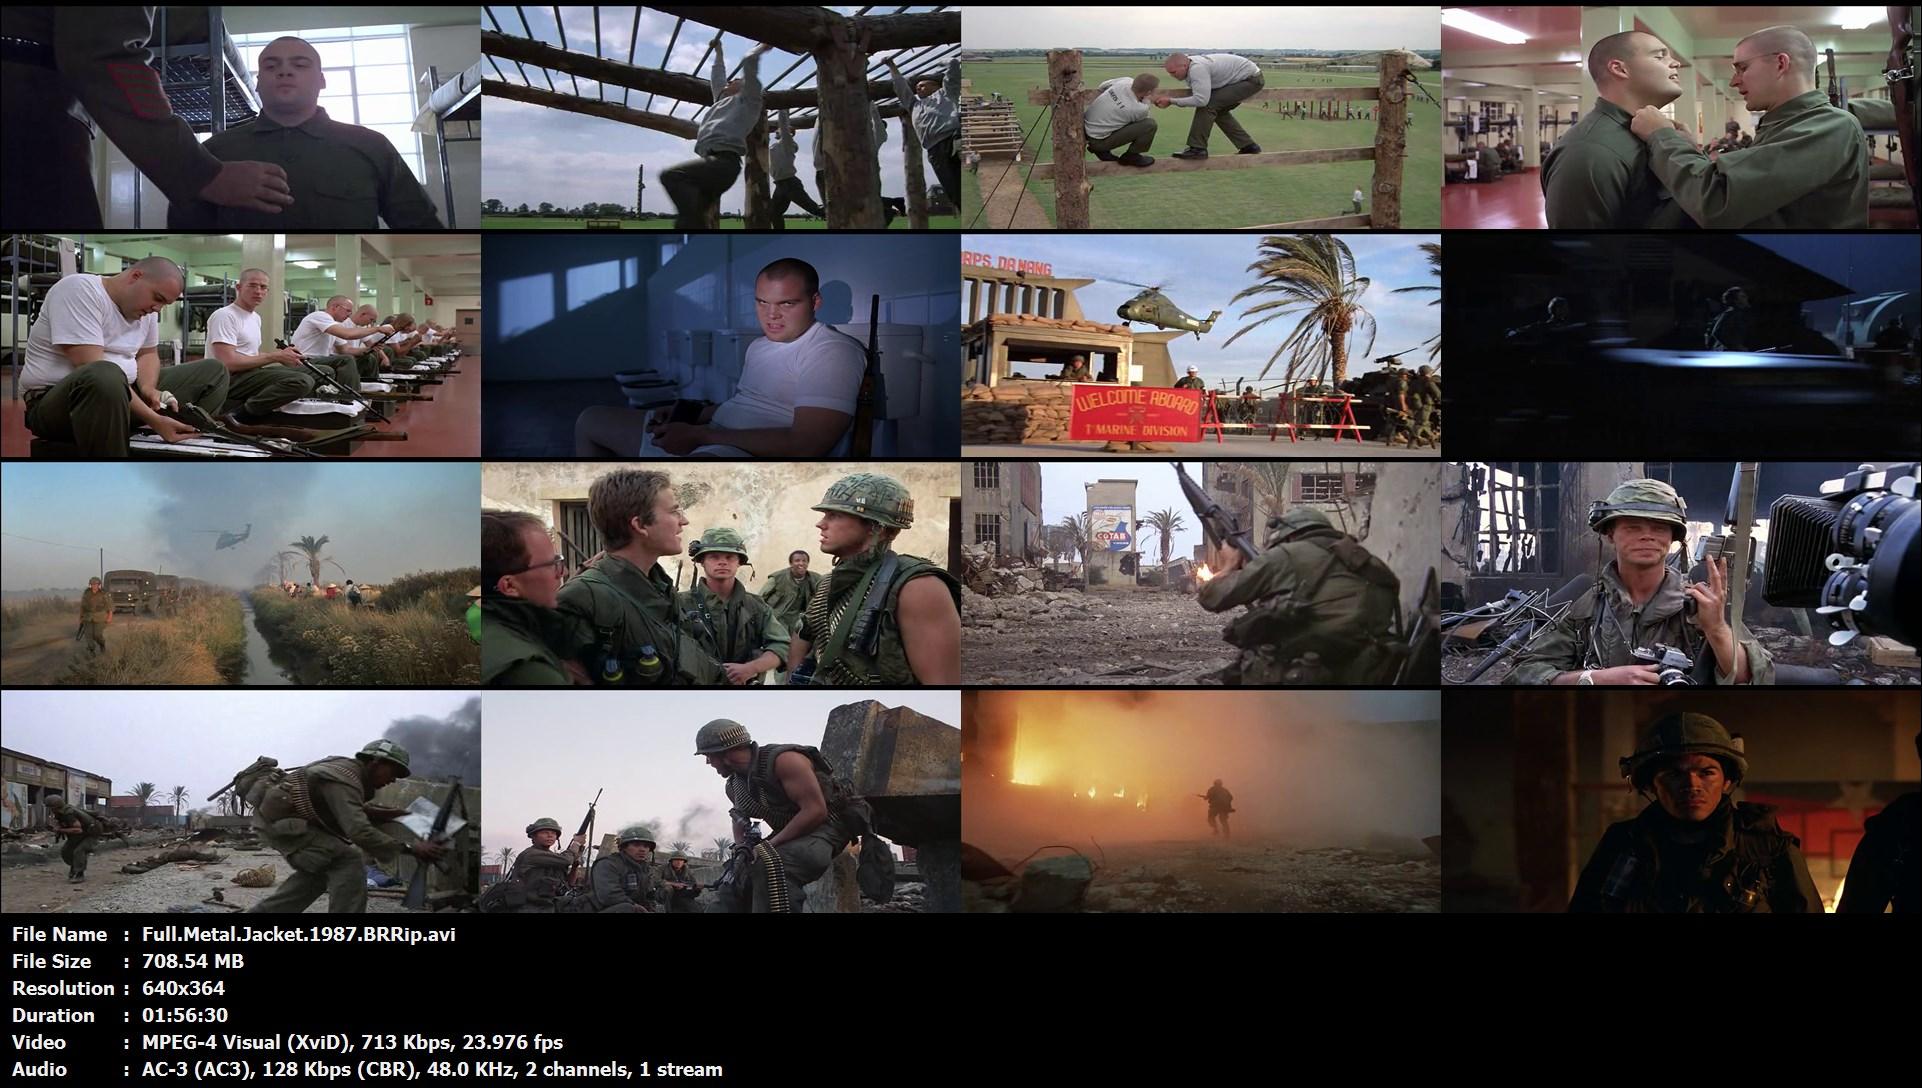 Full Movie Watch Full movie Full Metal Jacket 1987